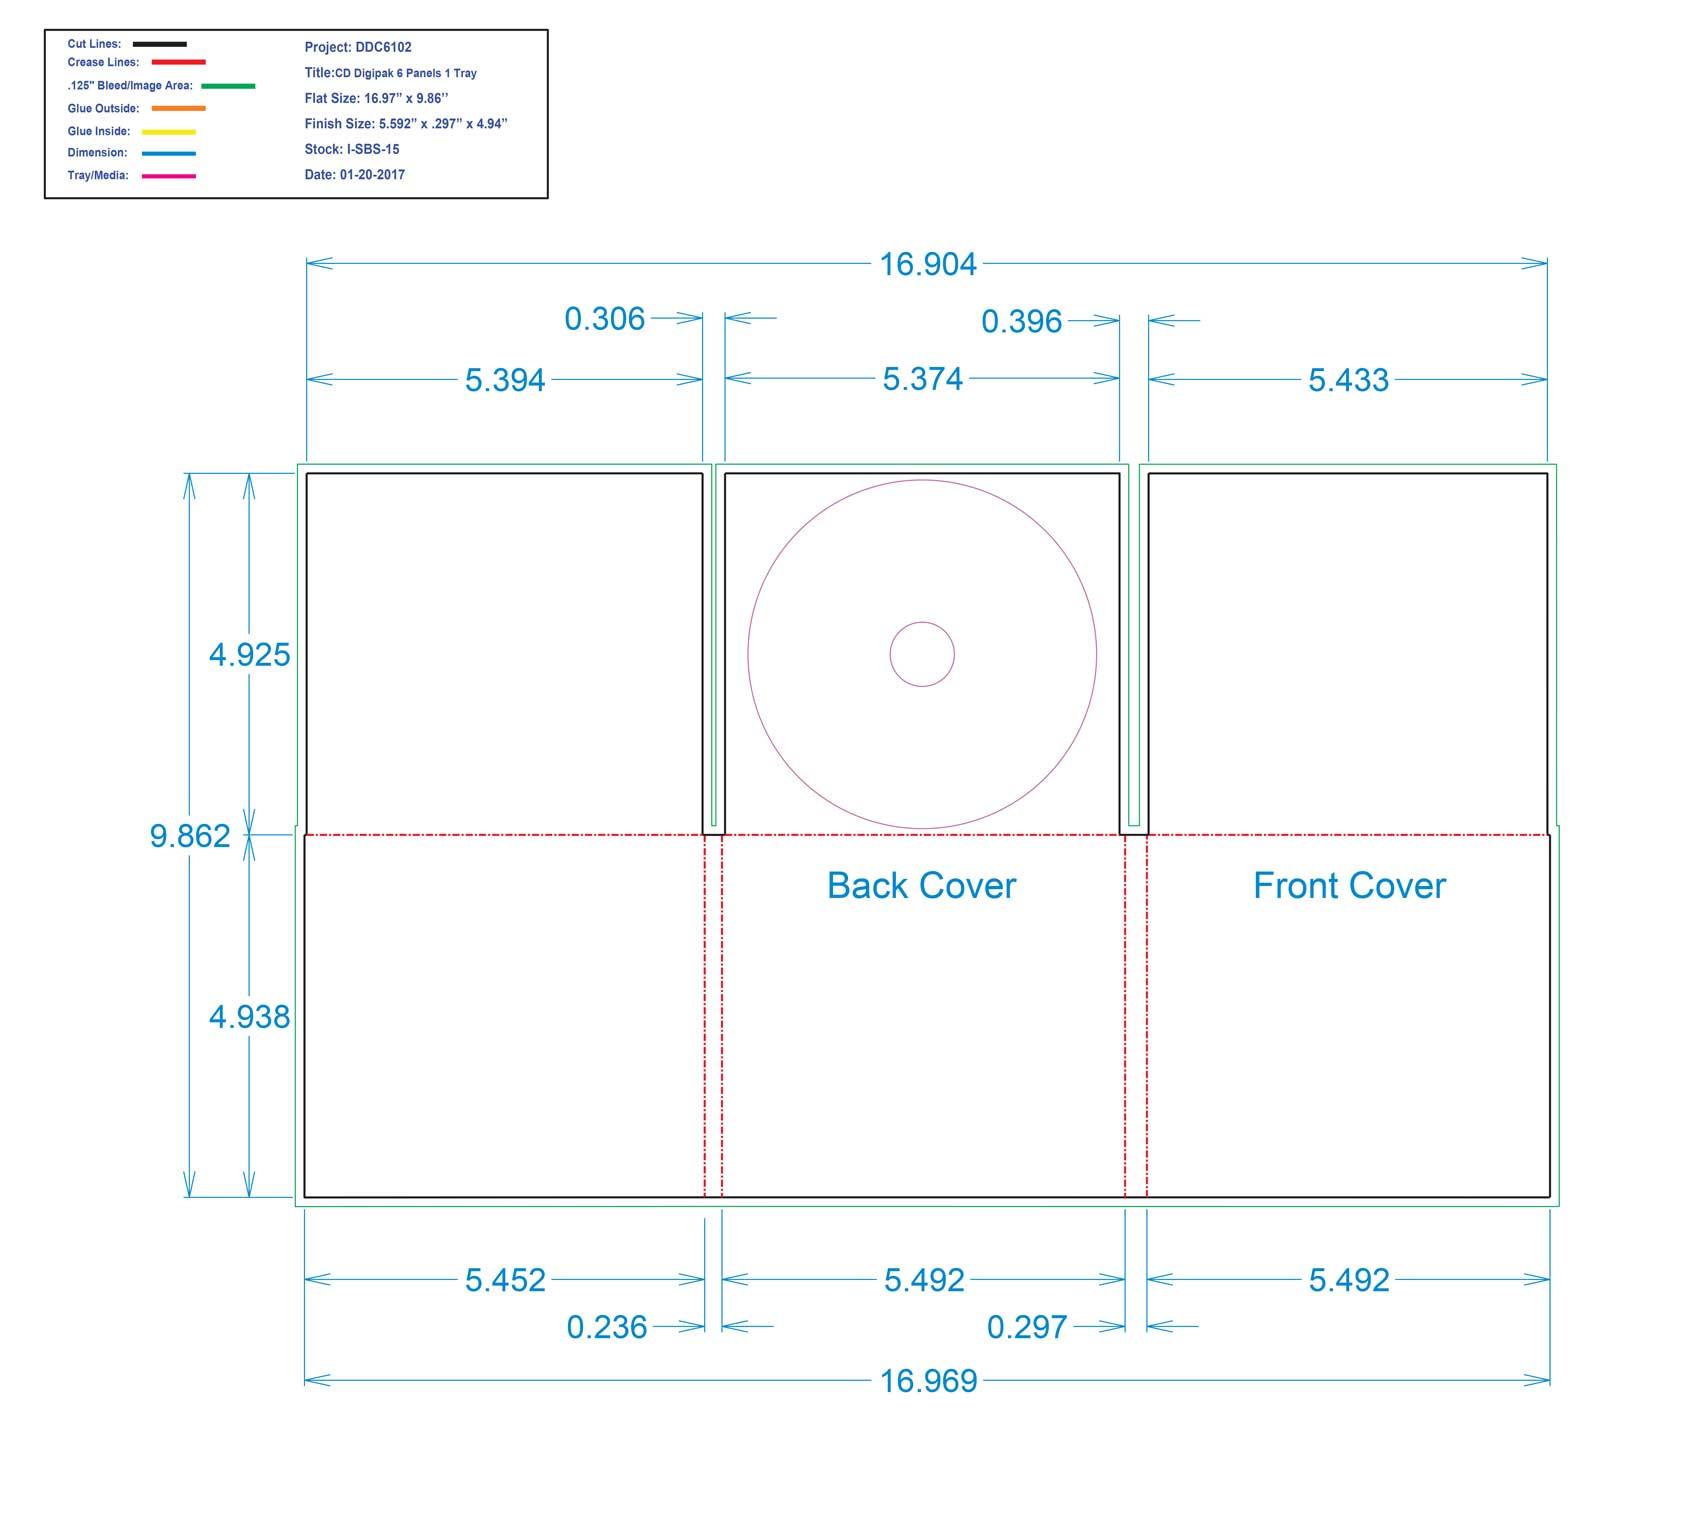 DDC6102 6 Panel Digi 1 Tray, No Pocket